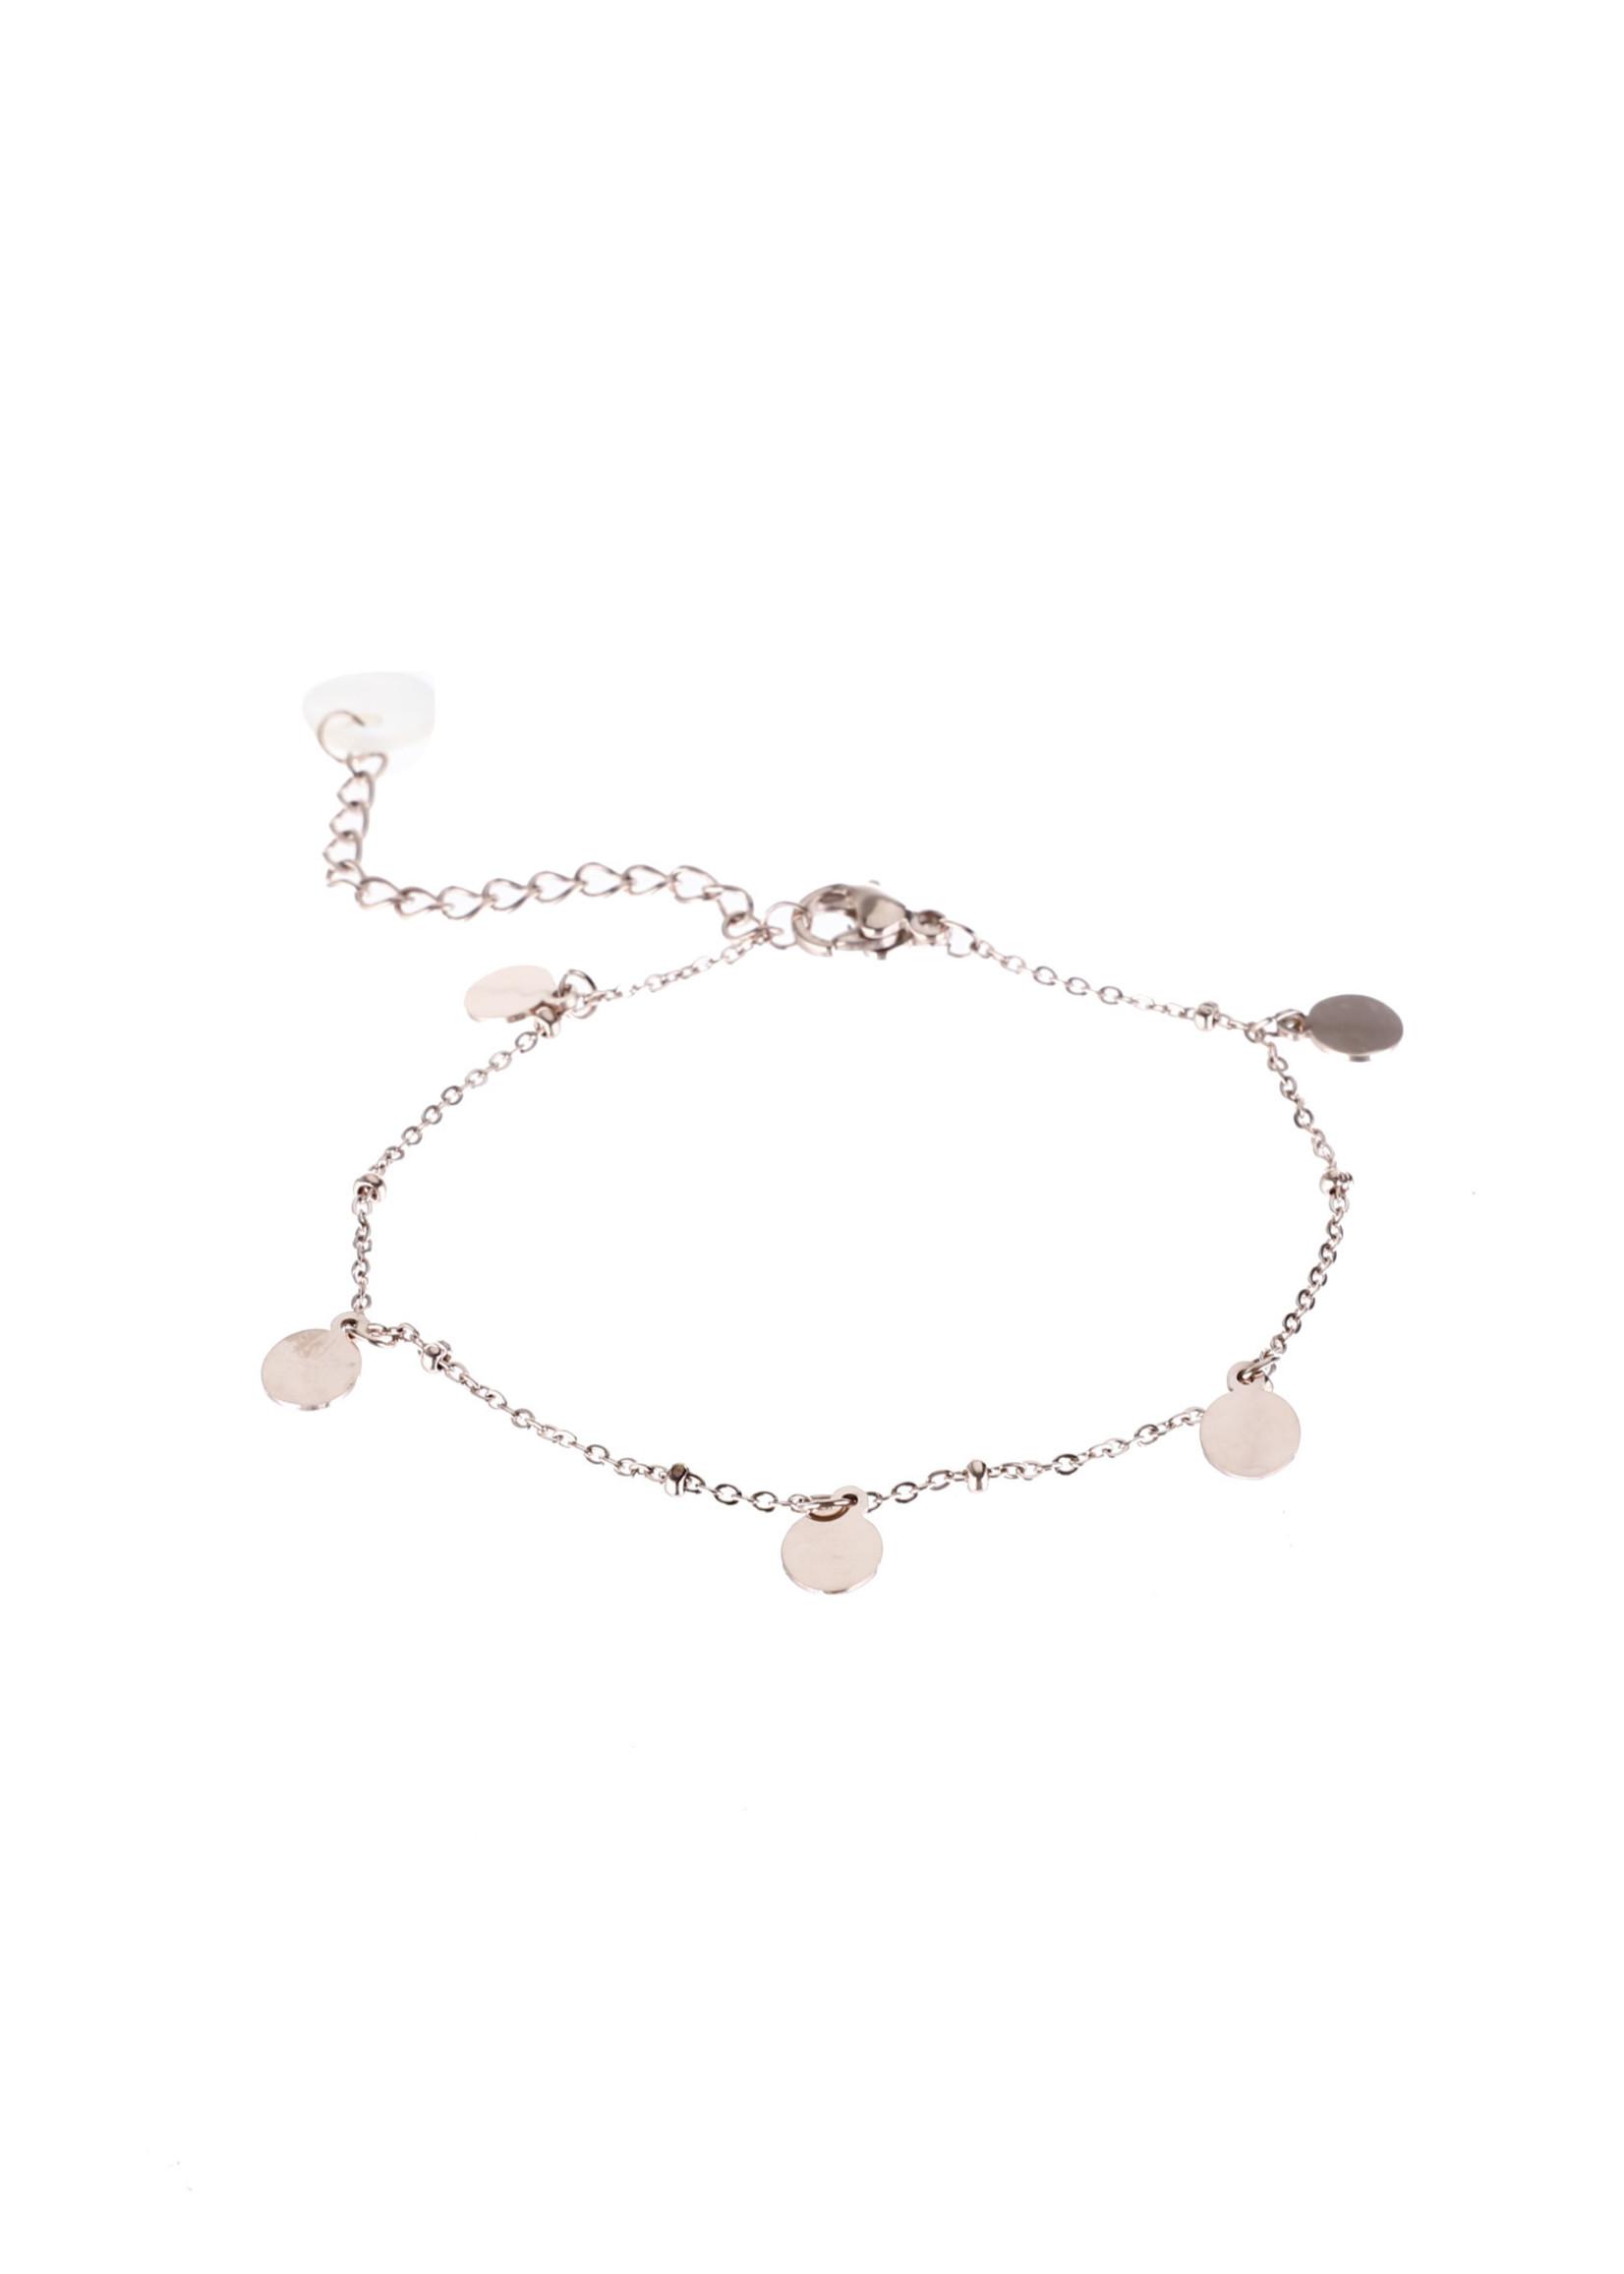 Armband rosé-goud muntjes B9313-3